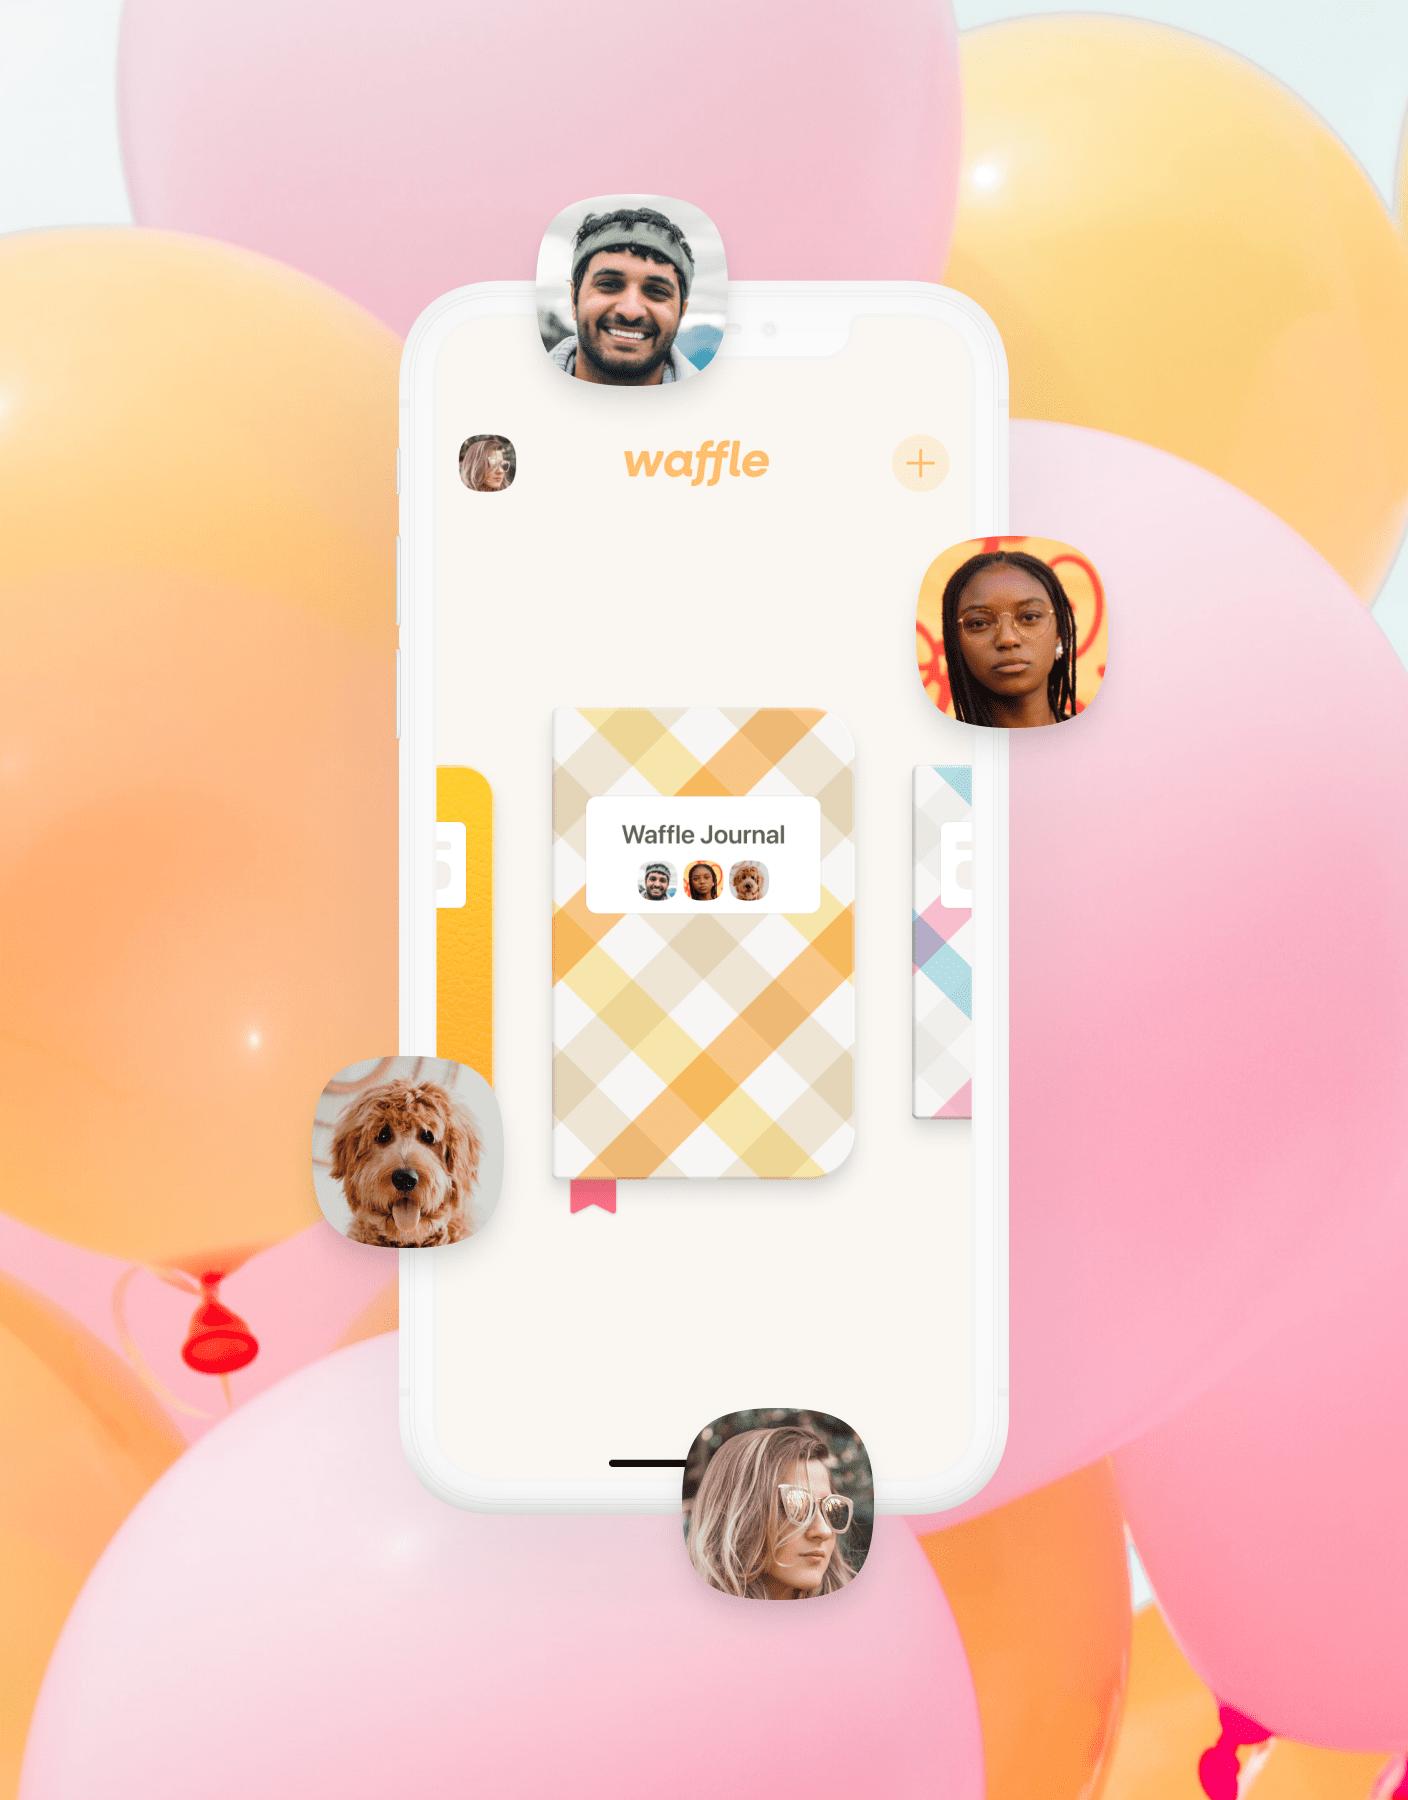 Waffle screen app designed by zypsy